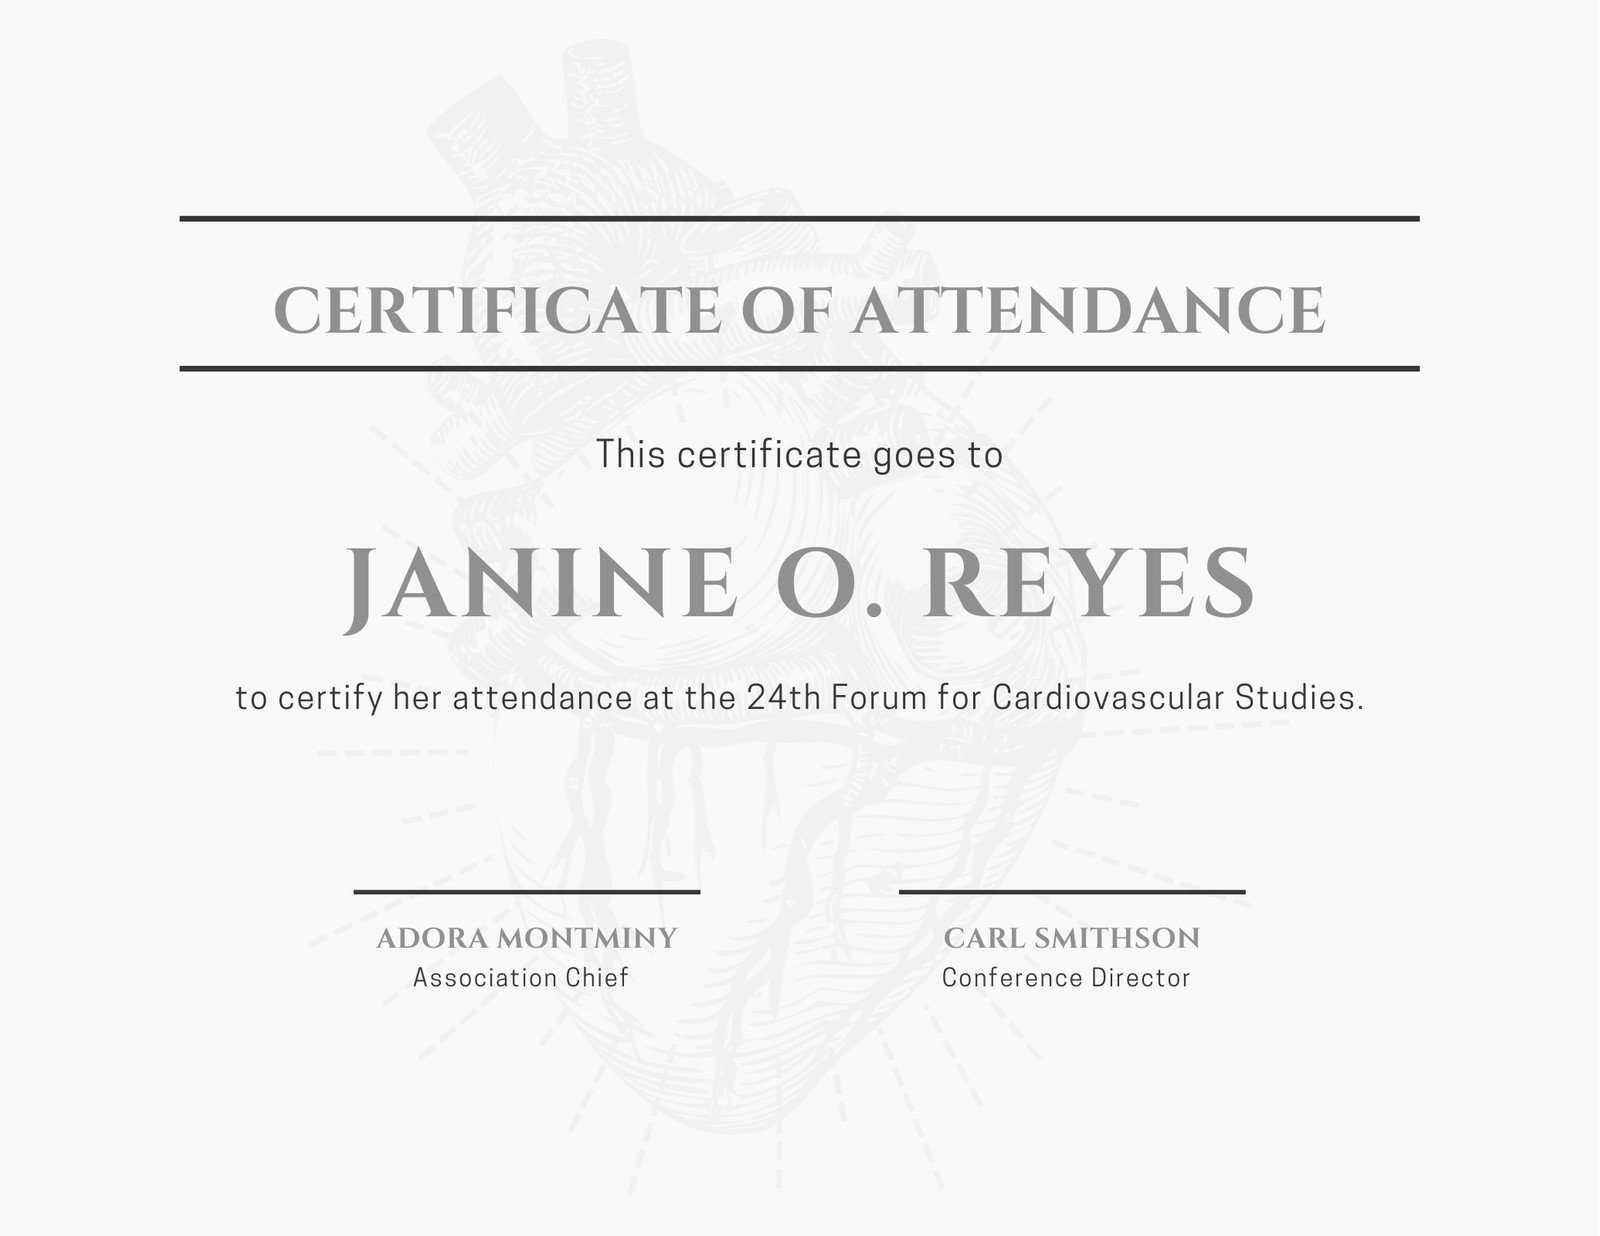 Minimalist Conference Attendance Certificate - Templates Within Certificate Of Attendance Conference Template